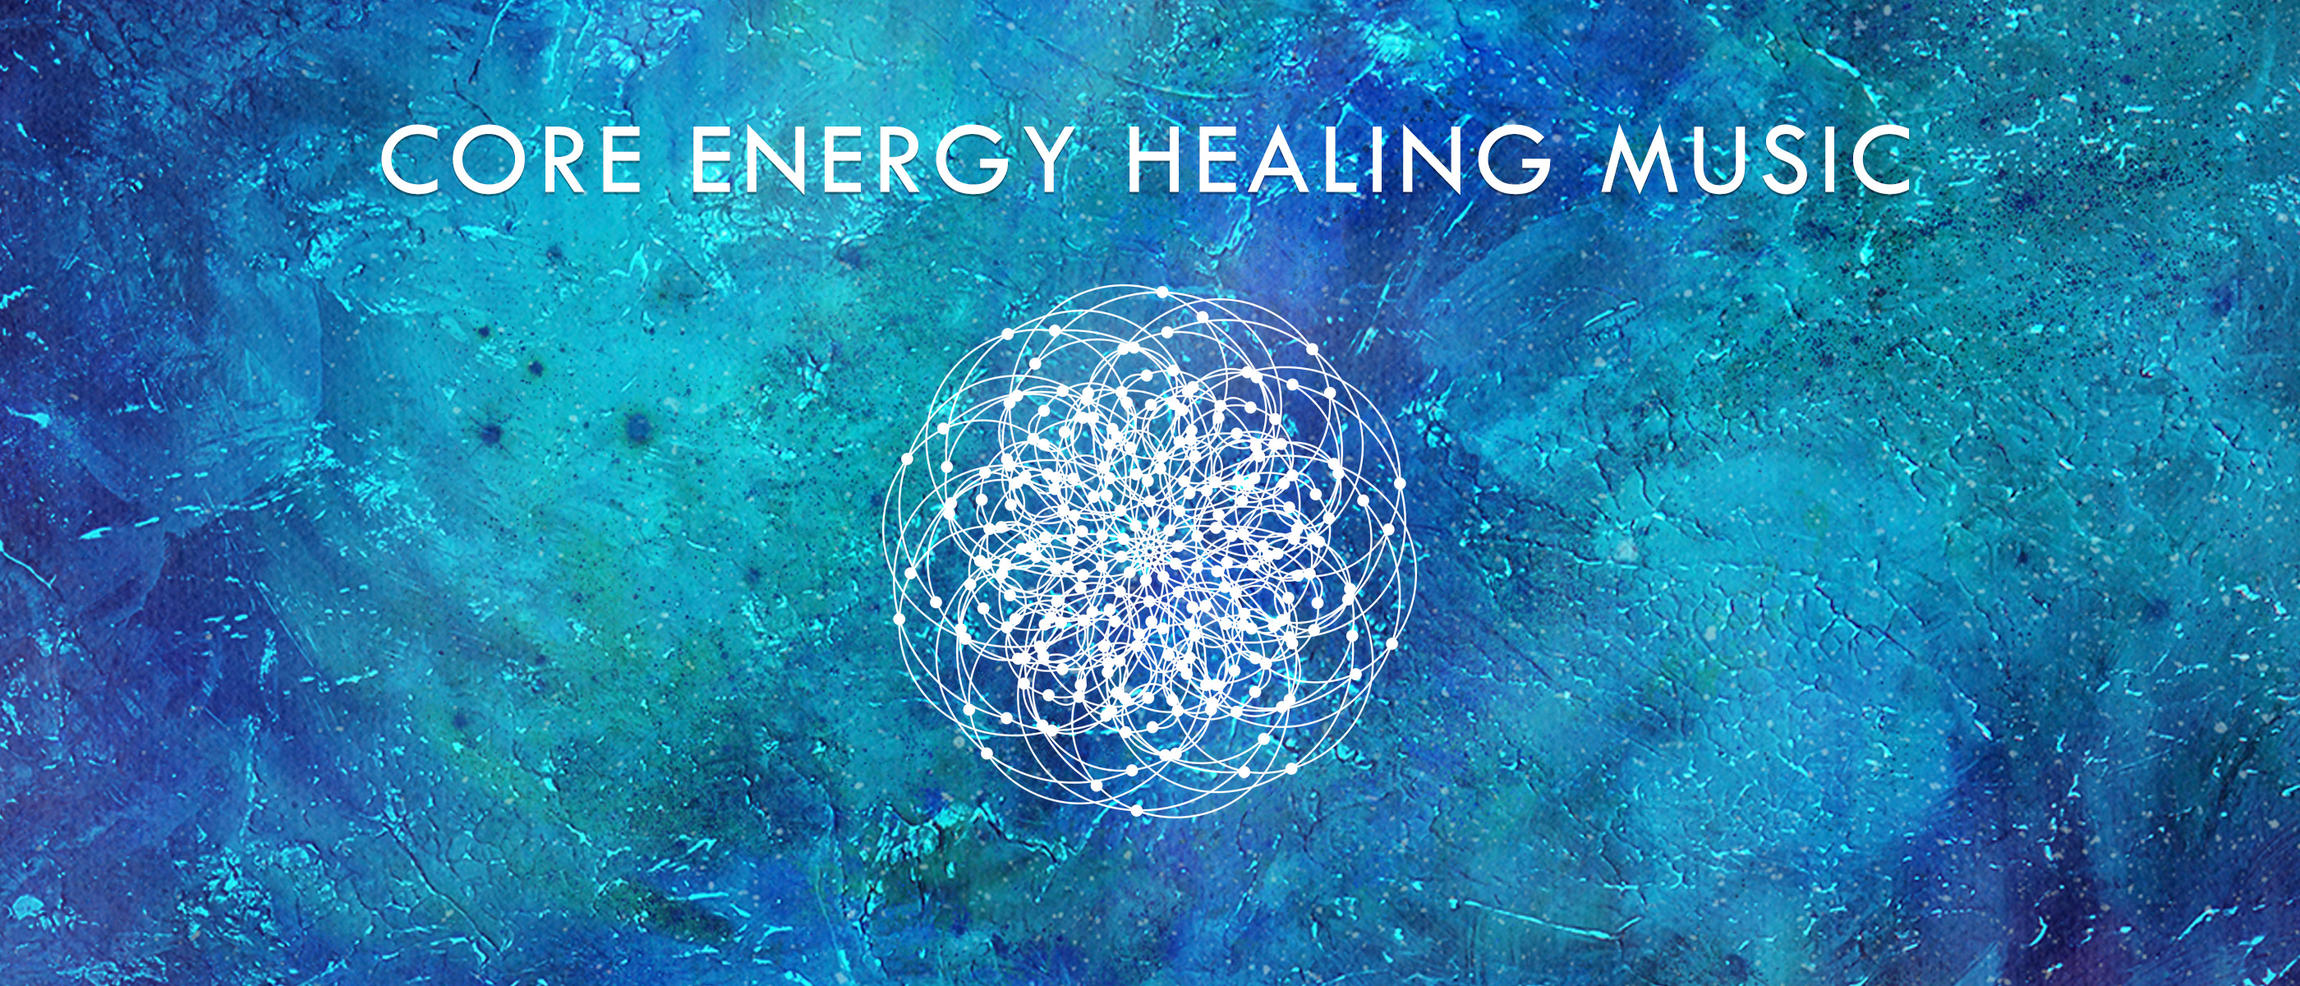 Core Energy Healing Music